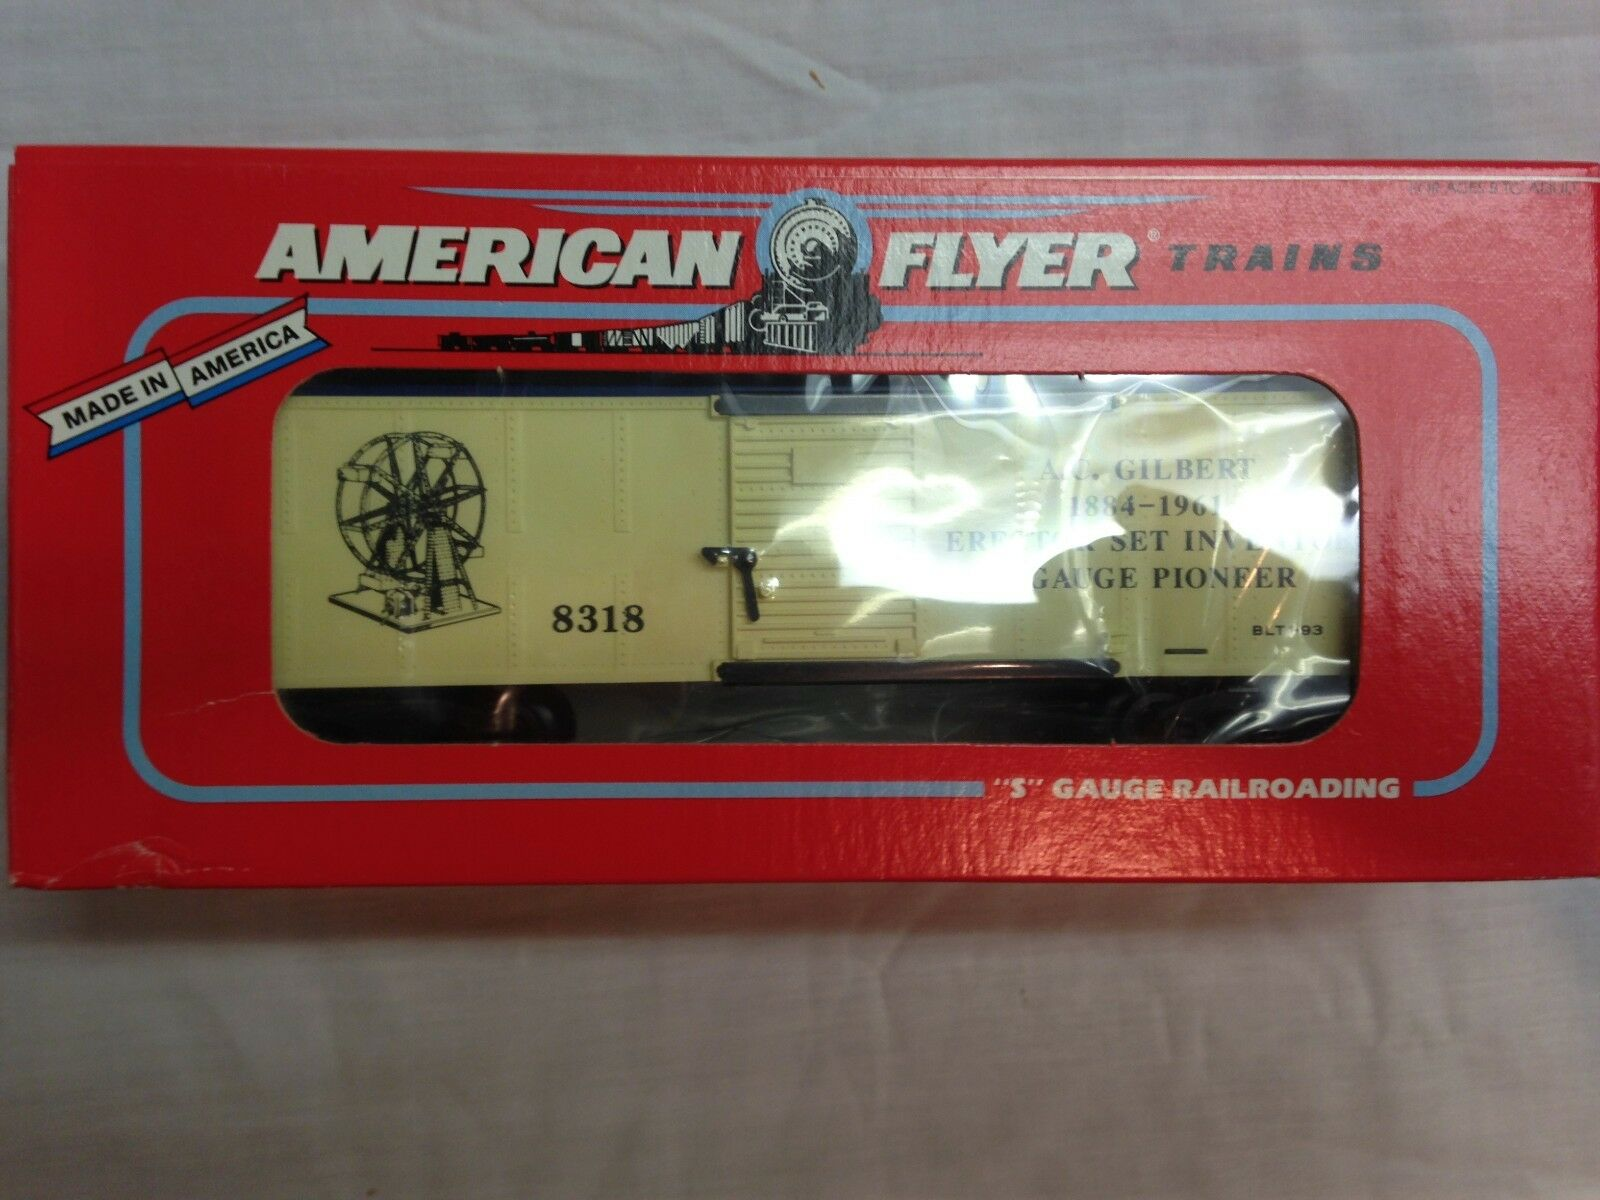 American Flyer Lionel 48318 1998 A.C. Gilbert Boxcar